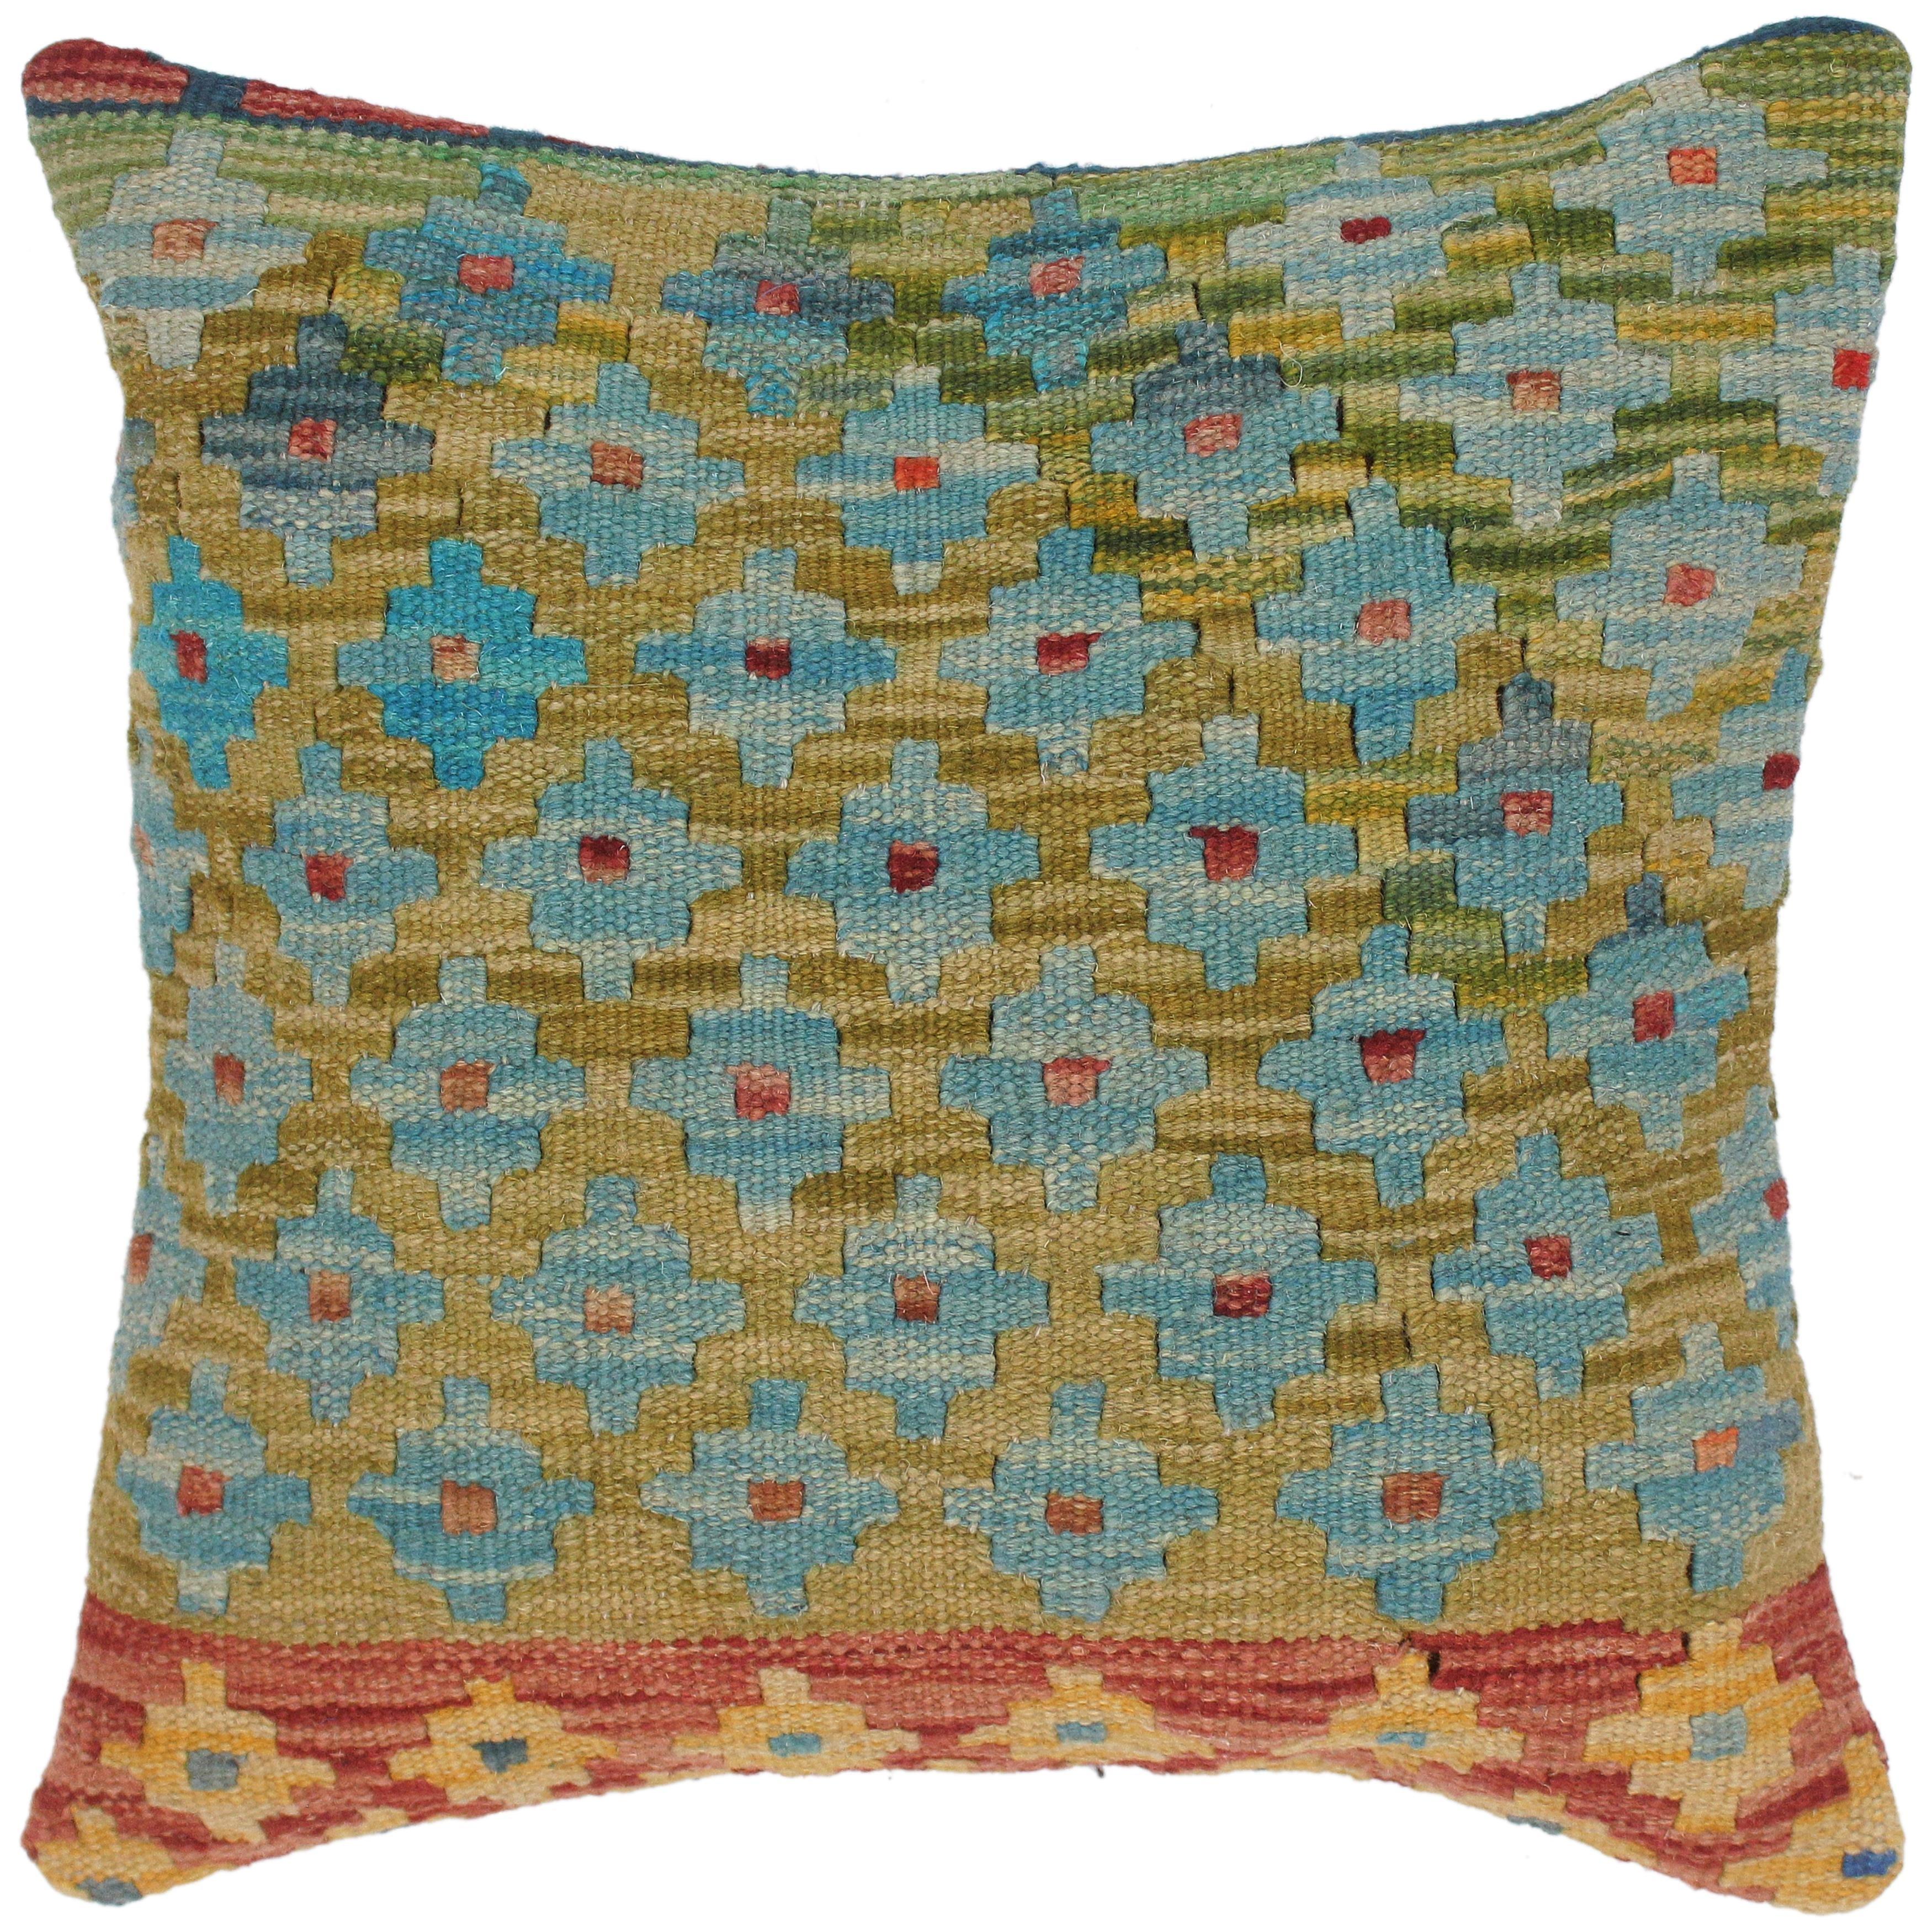 Modern Lizabeth Hand Woven Turkish Kilim Pillow 18 In X 18 In On Sale Overstock 32517350